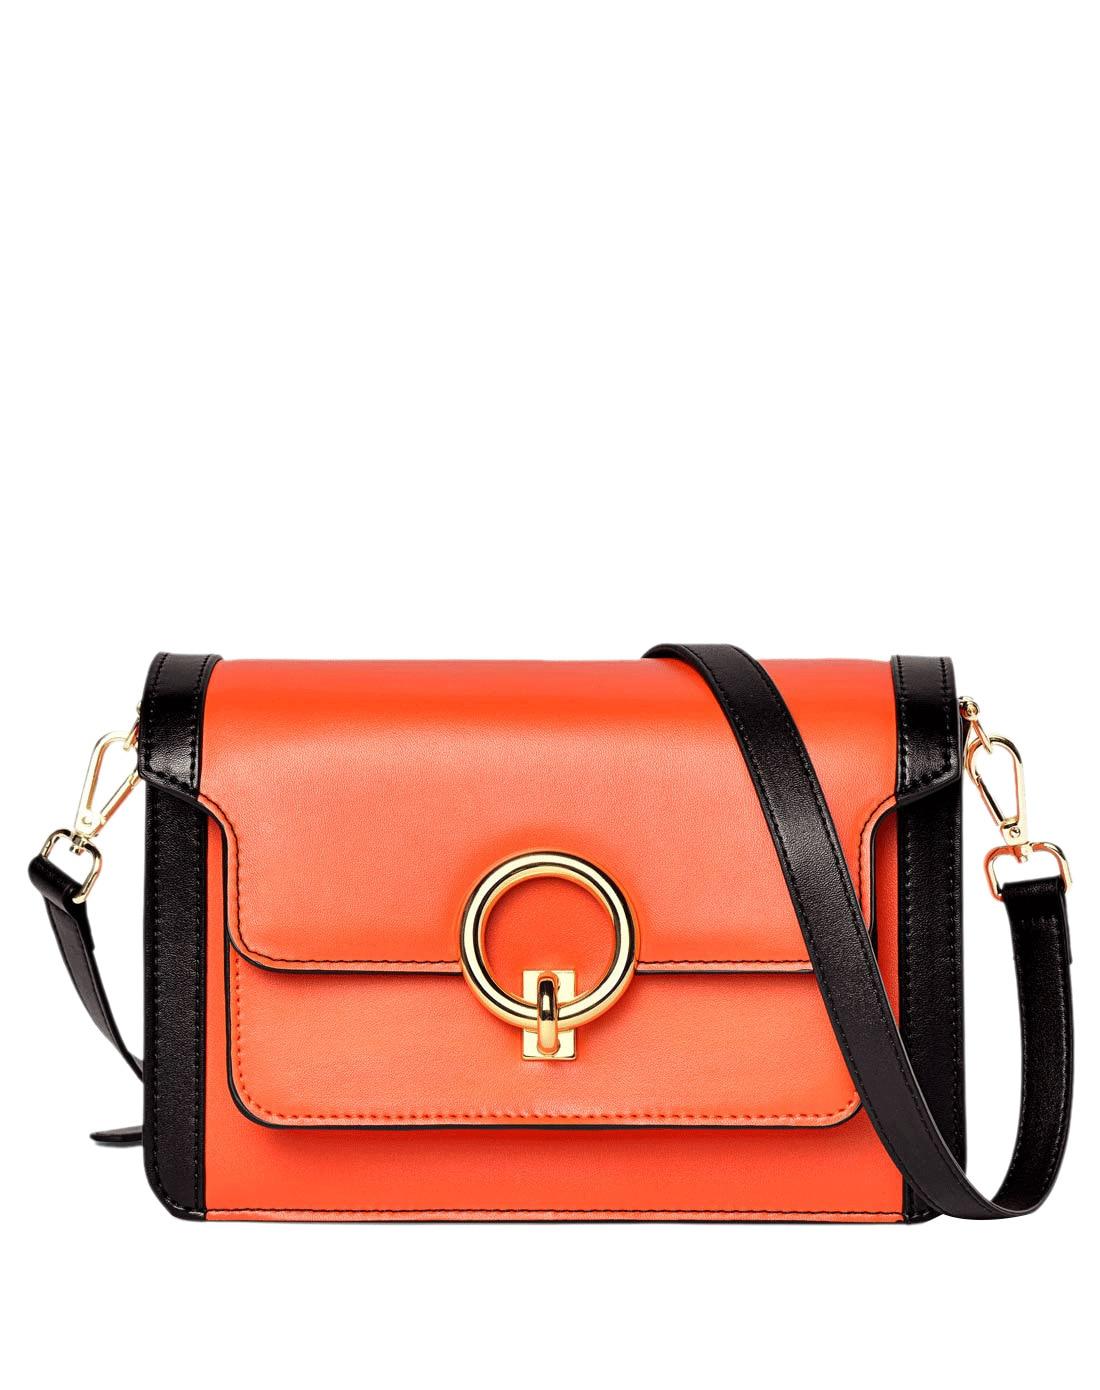 4 New type of ladys leather ladys bag; ladys cowhide ladys bag; one-shoulder BM55050 190426 jia4 New type of ladys leather ladys bag; ladys cowhide ladys bag; one-shoulder BM55050 190426 jia